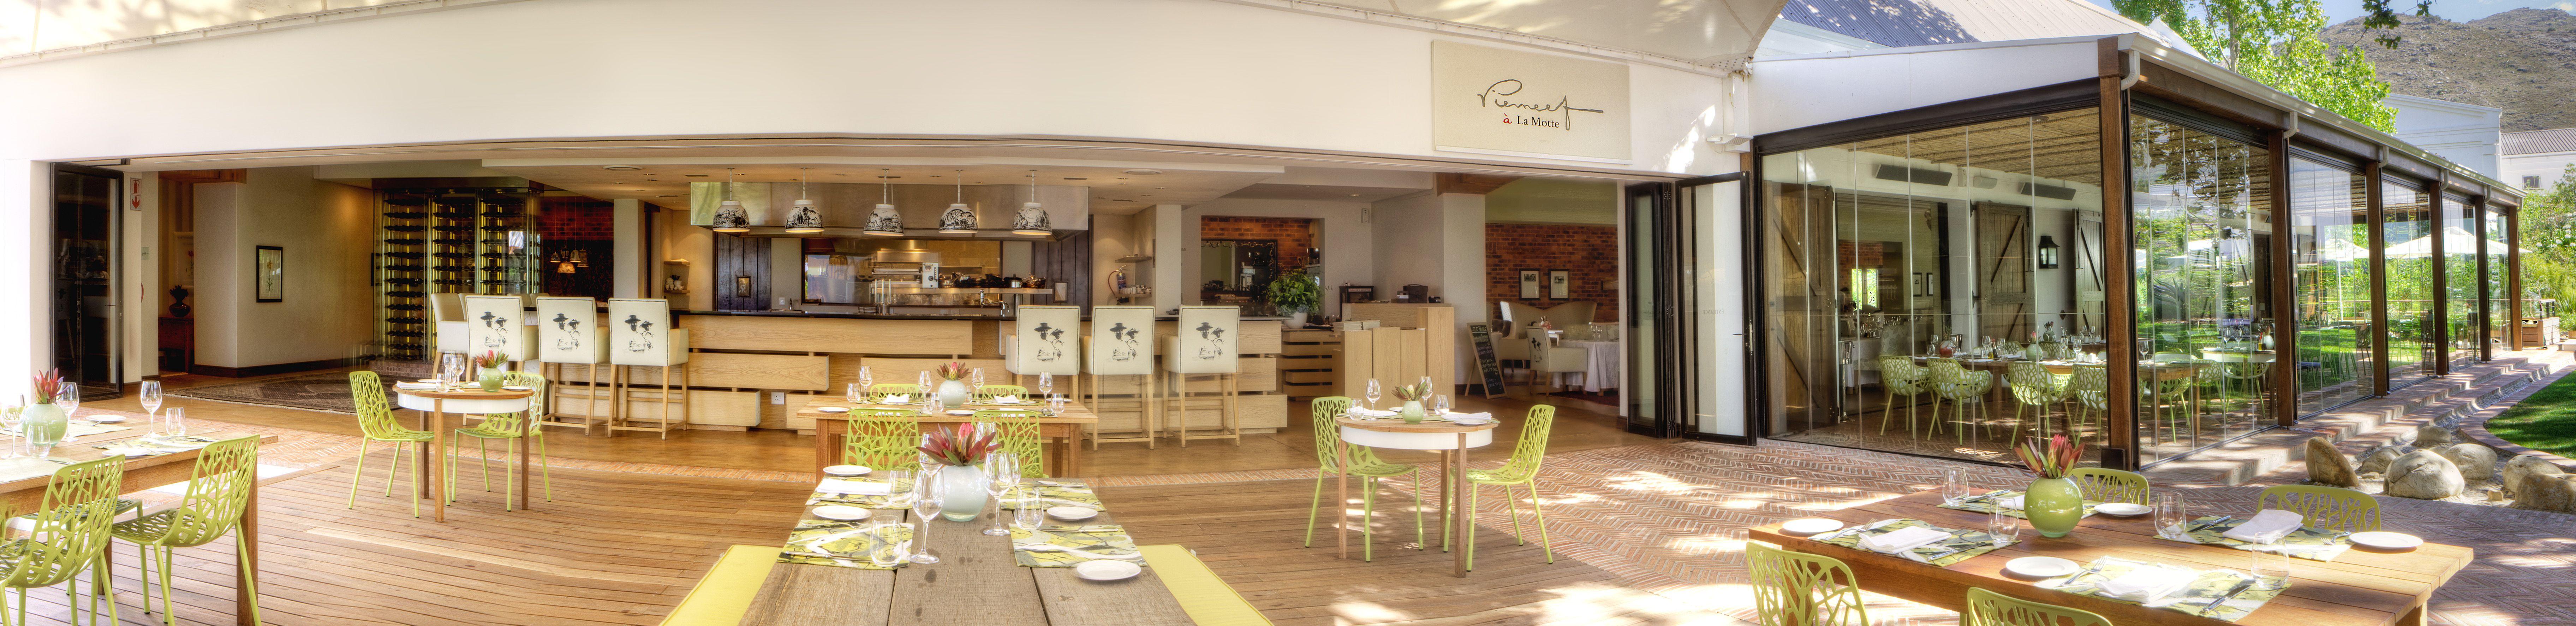 Enjoy A Red Or White Wine On Our Deck Lamotte Wine Food Franschhoek Restaurant Franschhoek Outdoor Decor